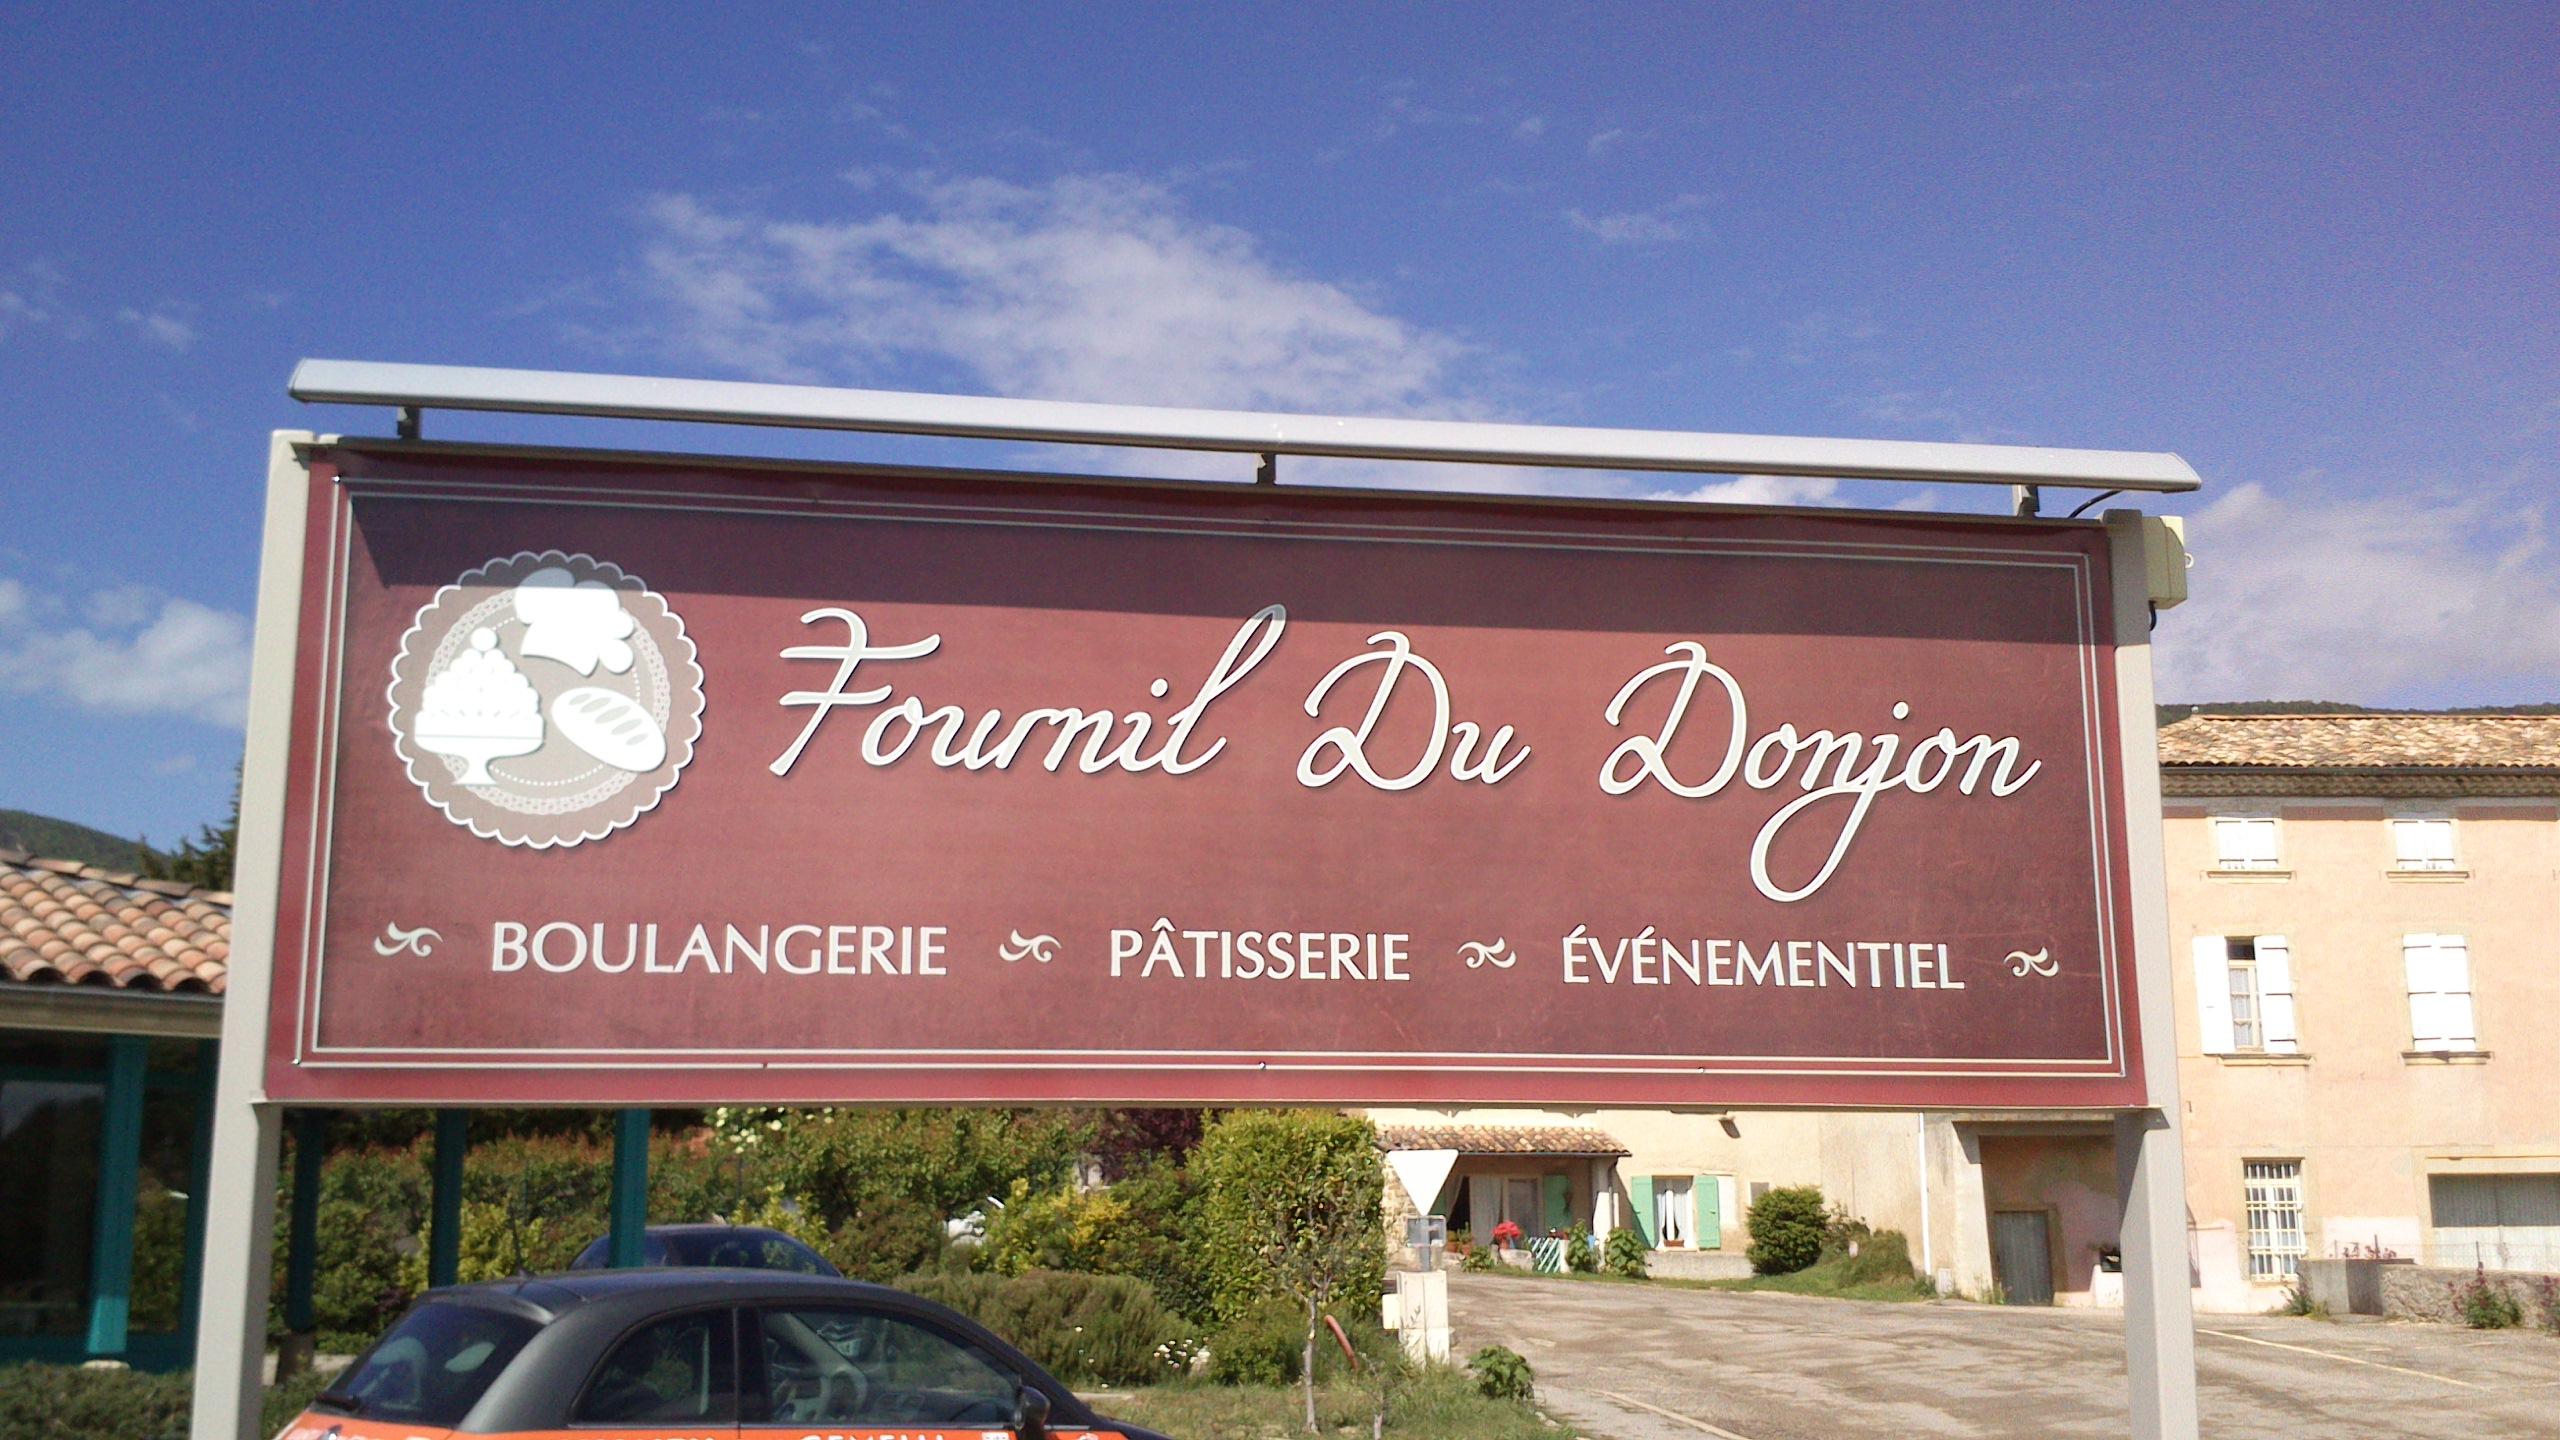 Fournil du Donjon